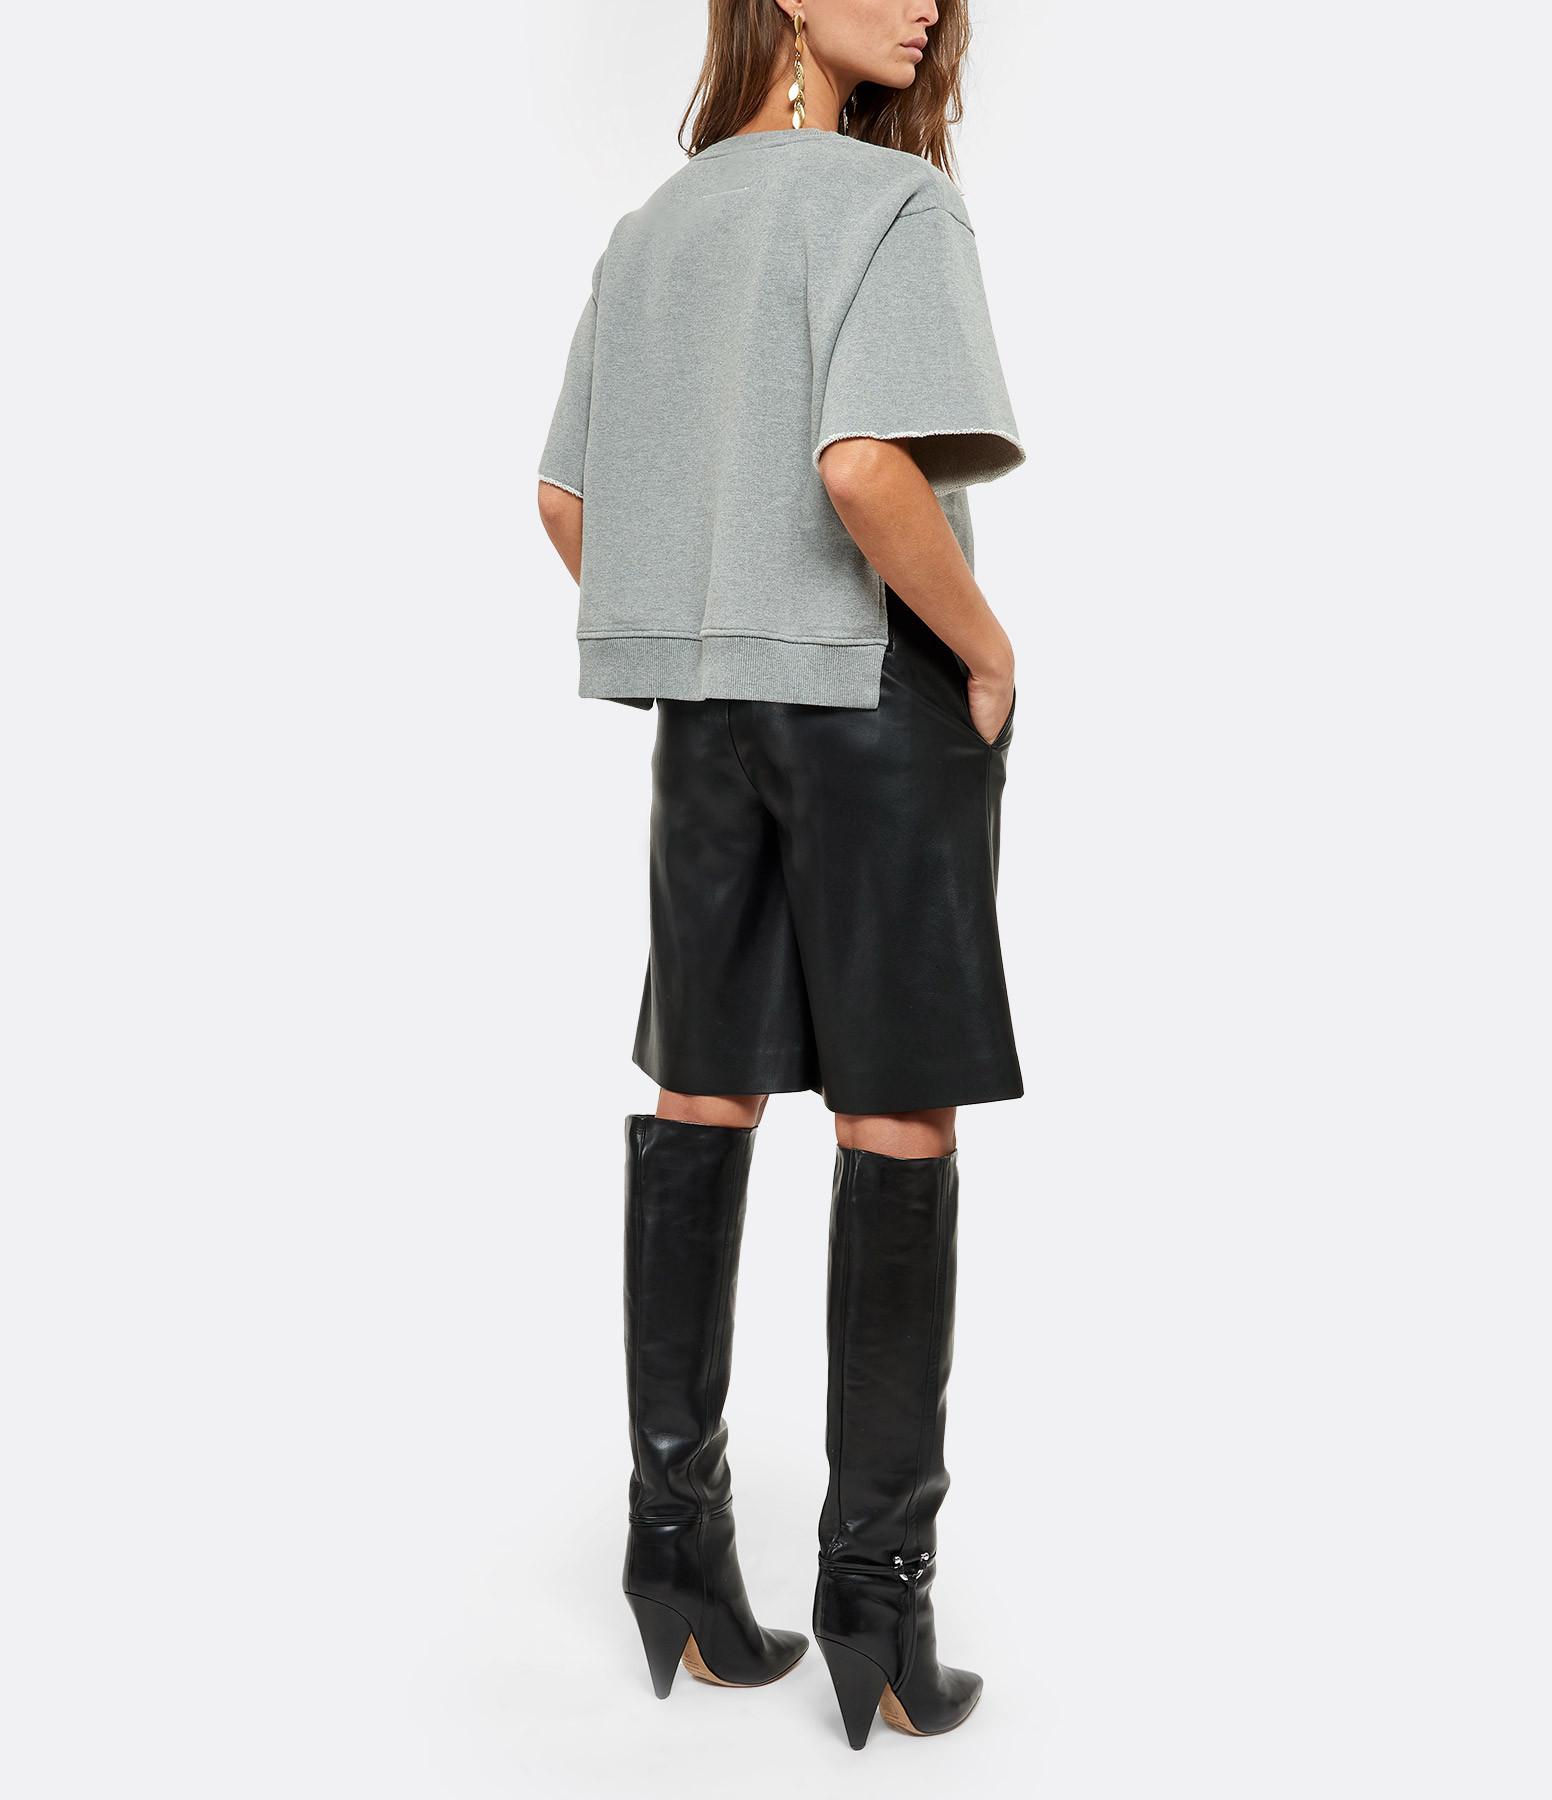 MM6 MAISON MARGIELA - Sweatshirt Oversize Gris